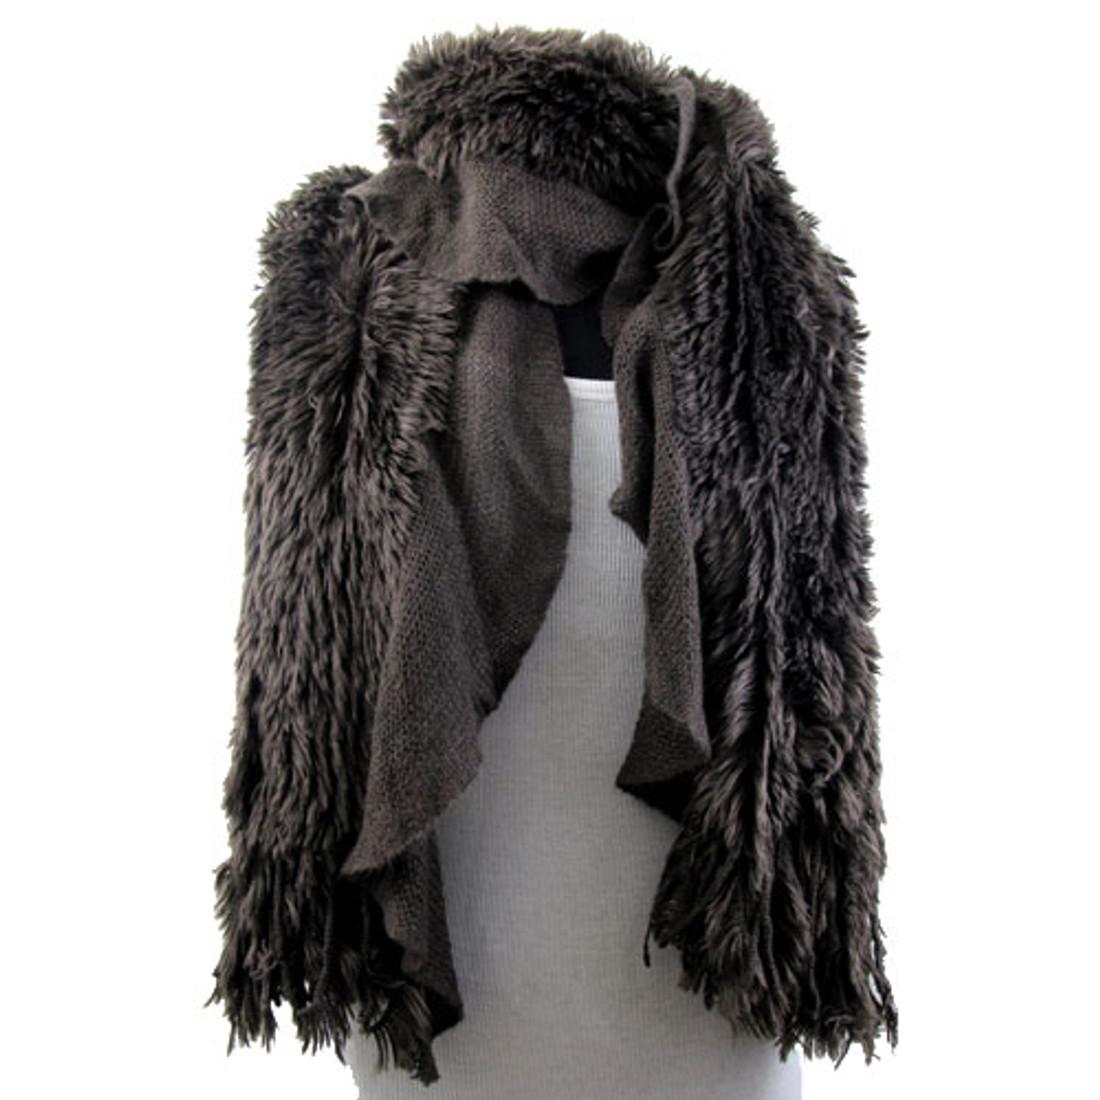 Brown scarf.